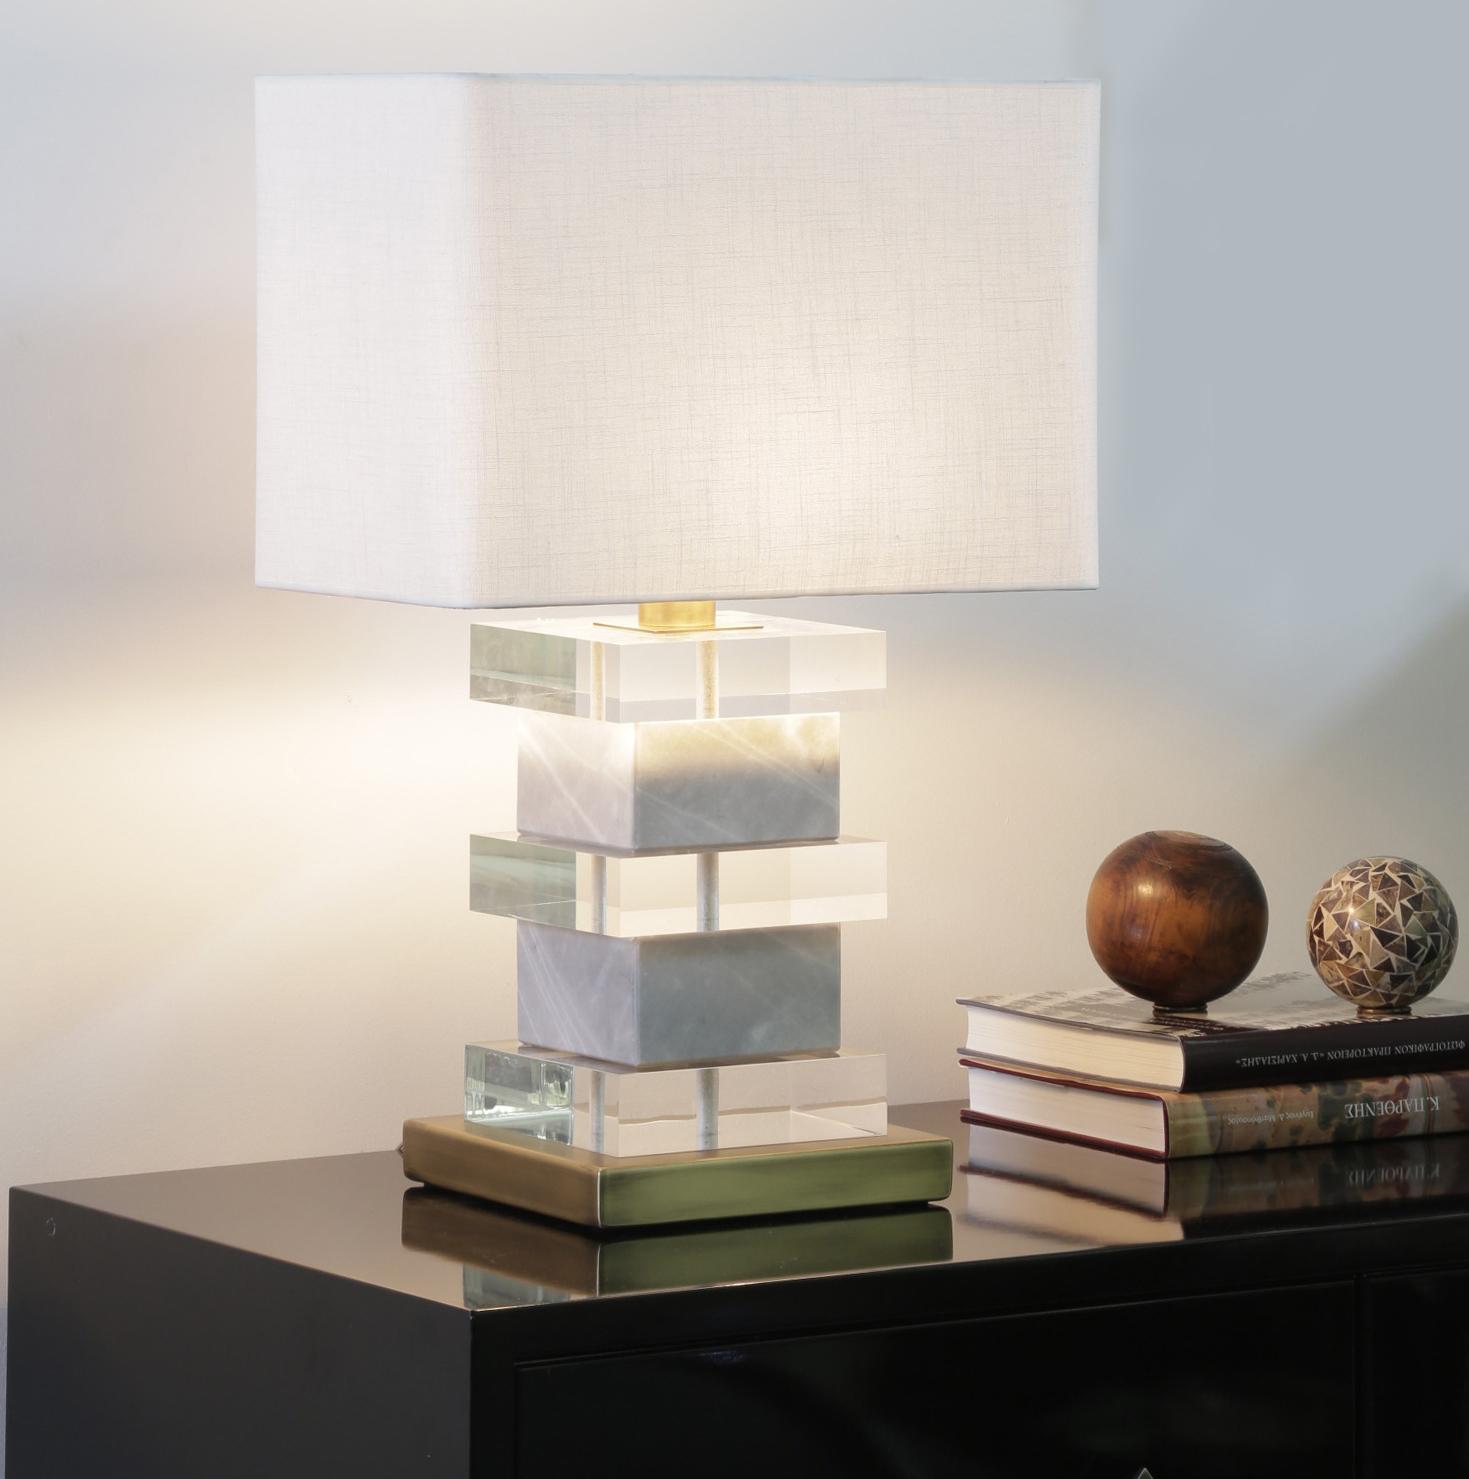 Luxury blocked plexiglass & marble handmade lamp with bronze details